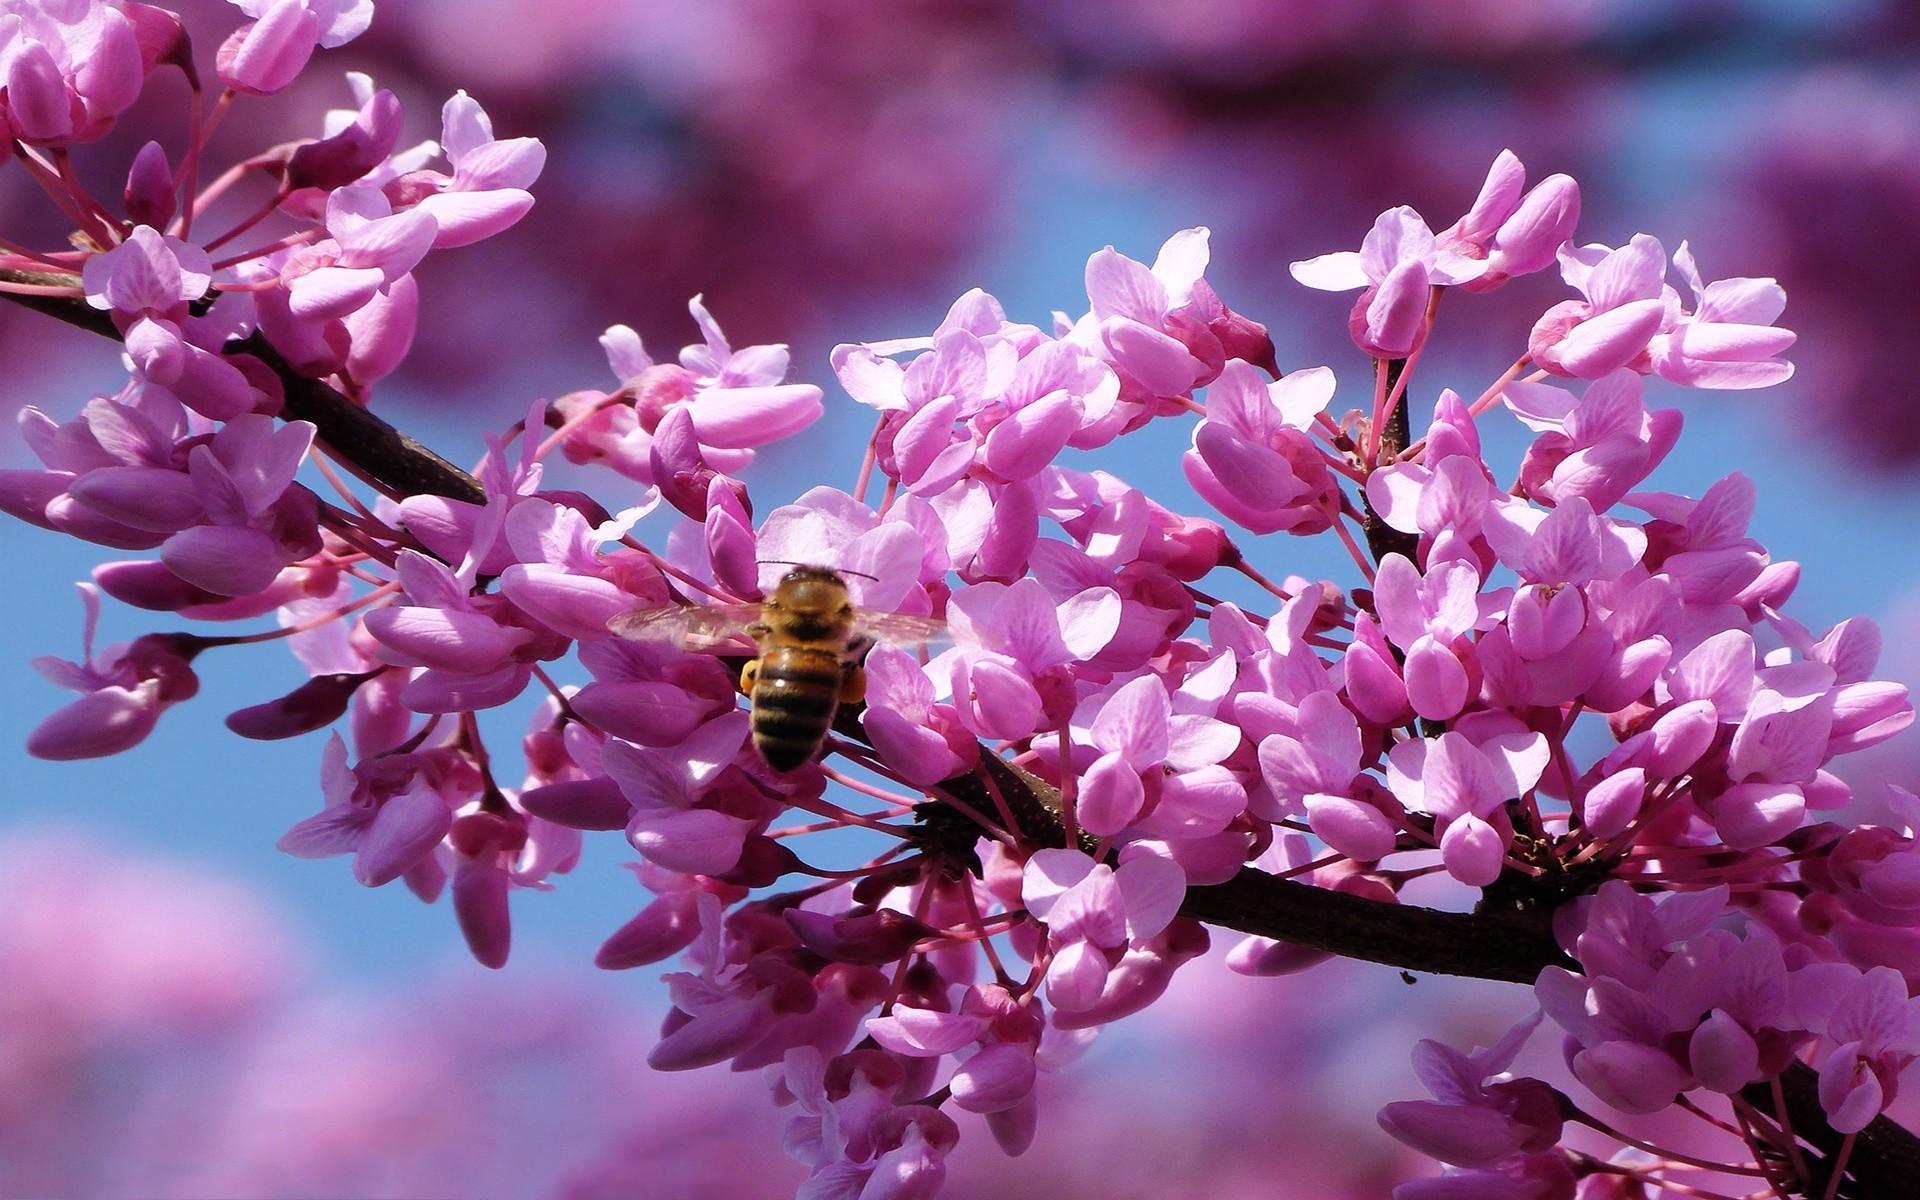 … Pink Blossom Spring Wallpaper Wallpapers Mrwallpaper.